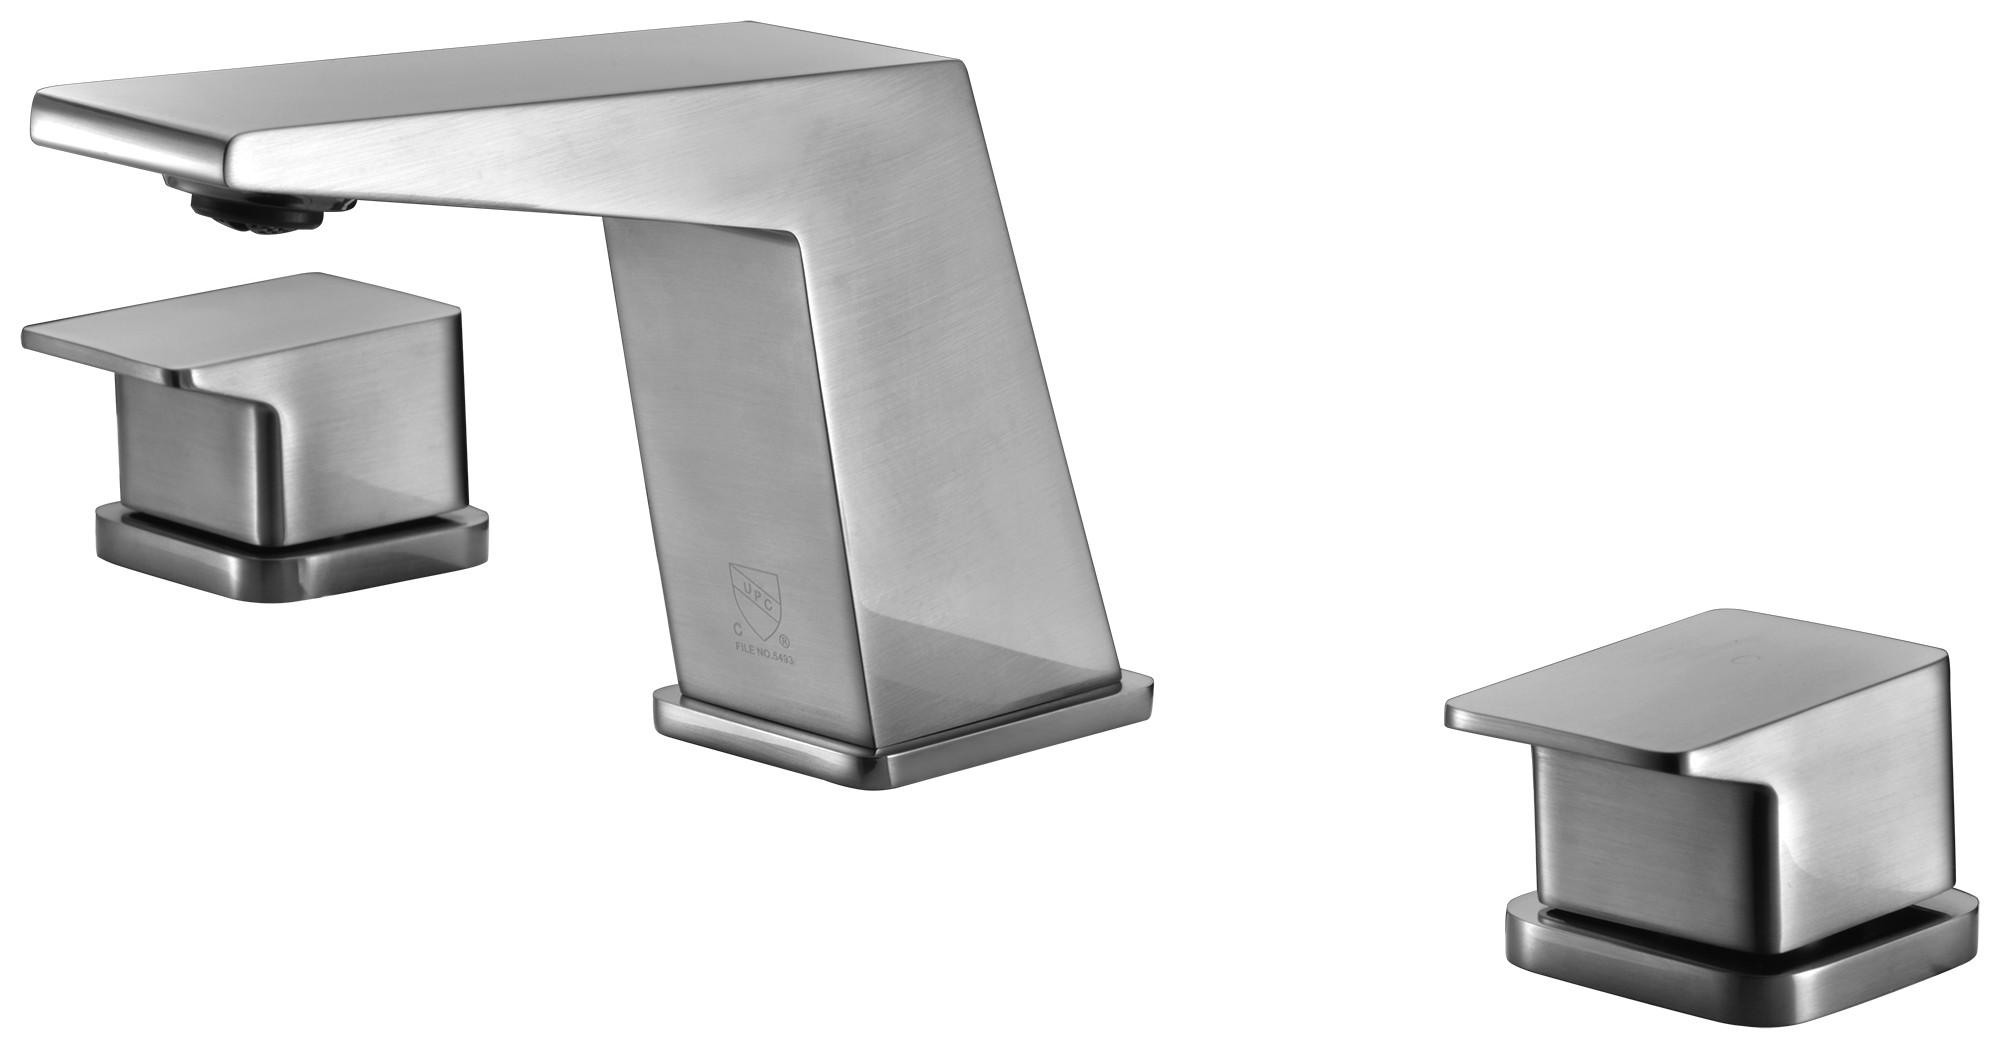 ALFI brand AB1471-BN Brushed Nickel Modern Widespread Bathroom Faucet